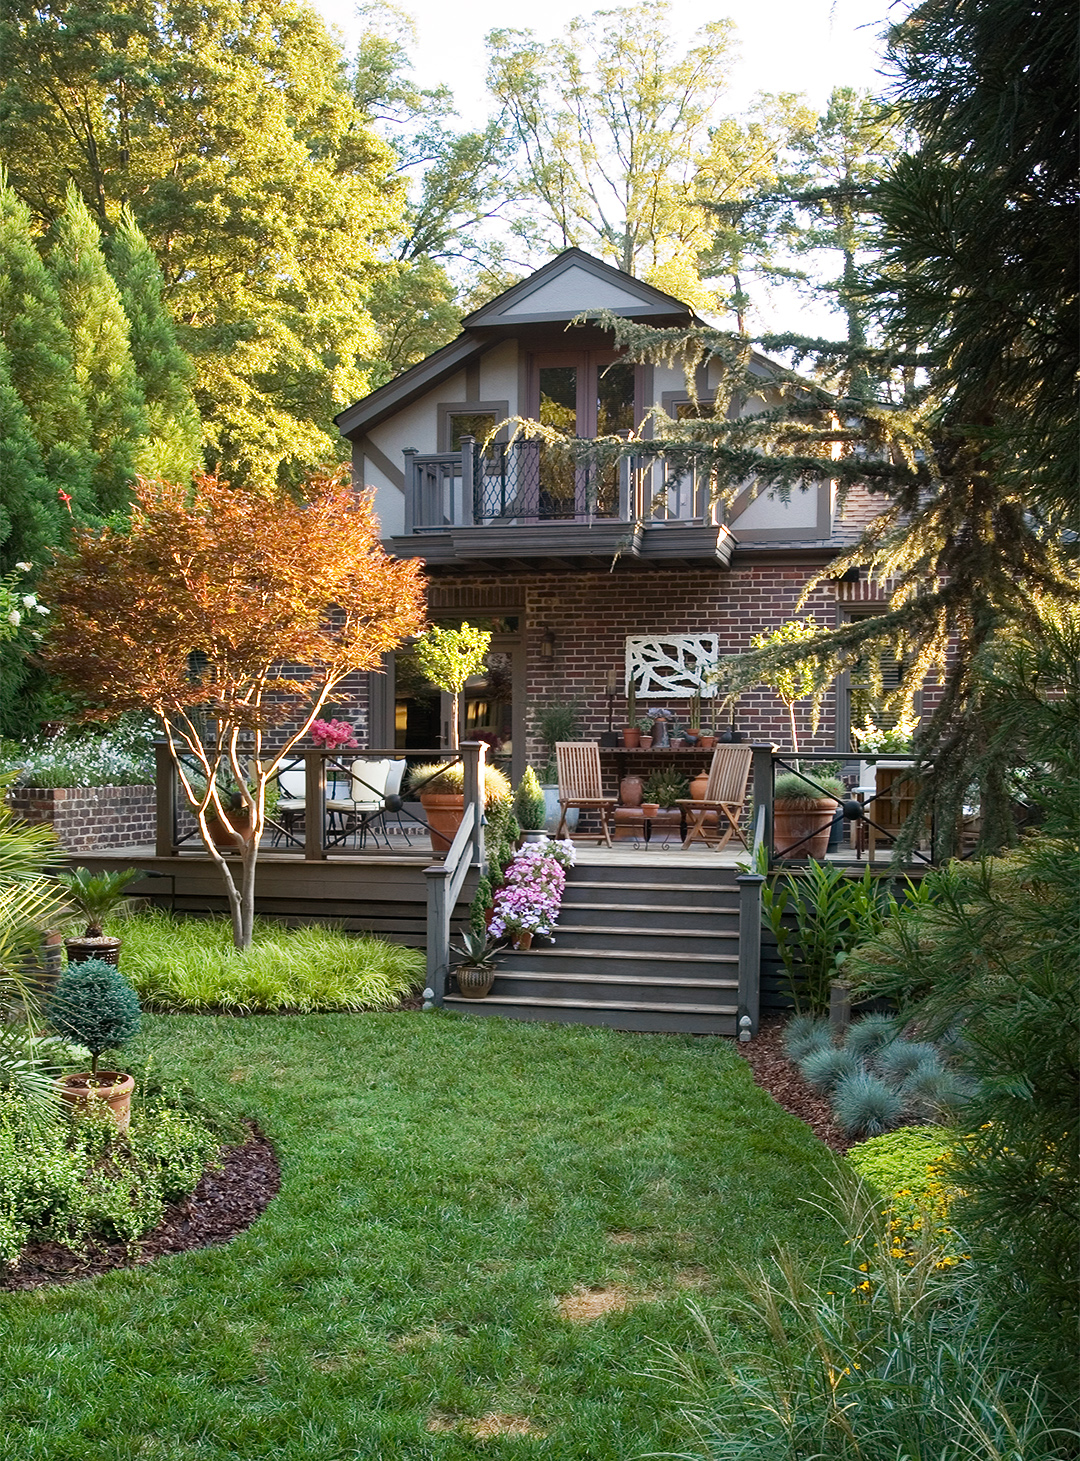 Easy Landscaping Ideas | Better Homes & Gardens on Easy Back Garden Ideas id=63368